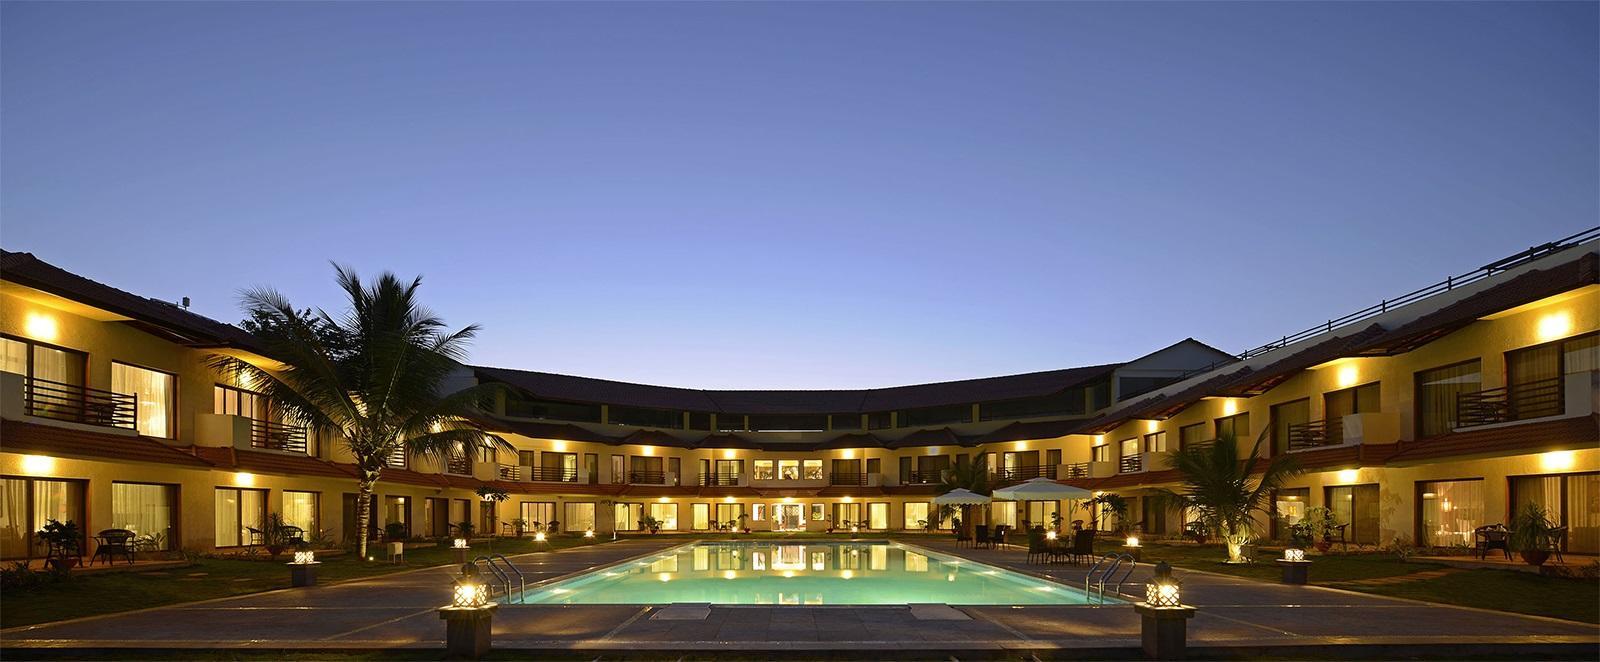 U Tropicana Alibaug Hotel Overview